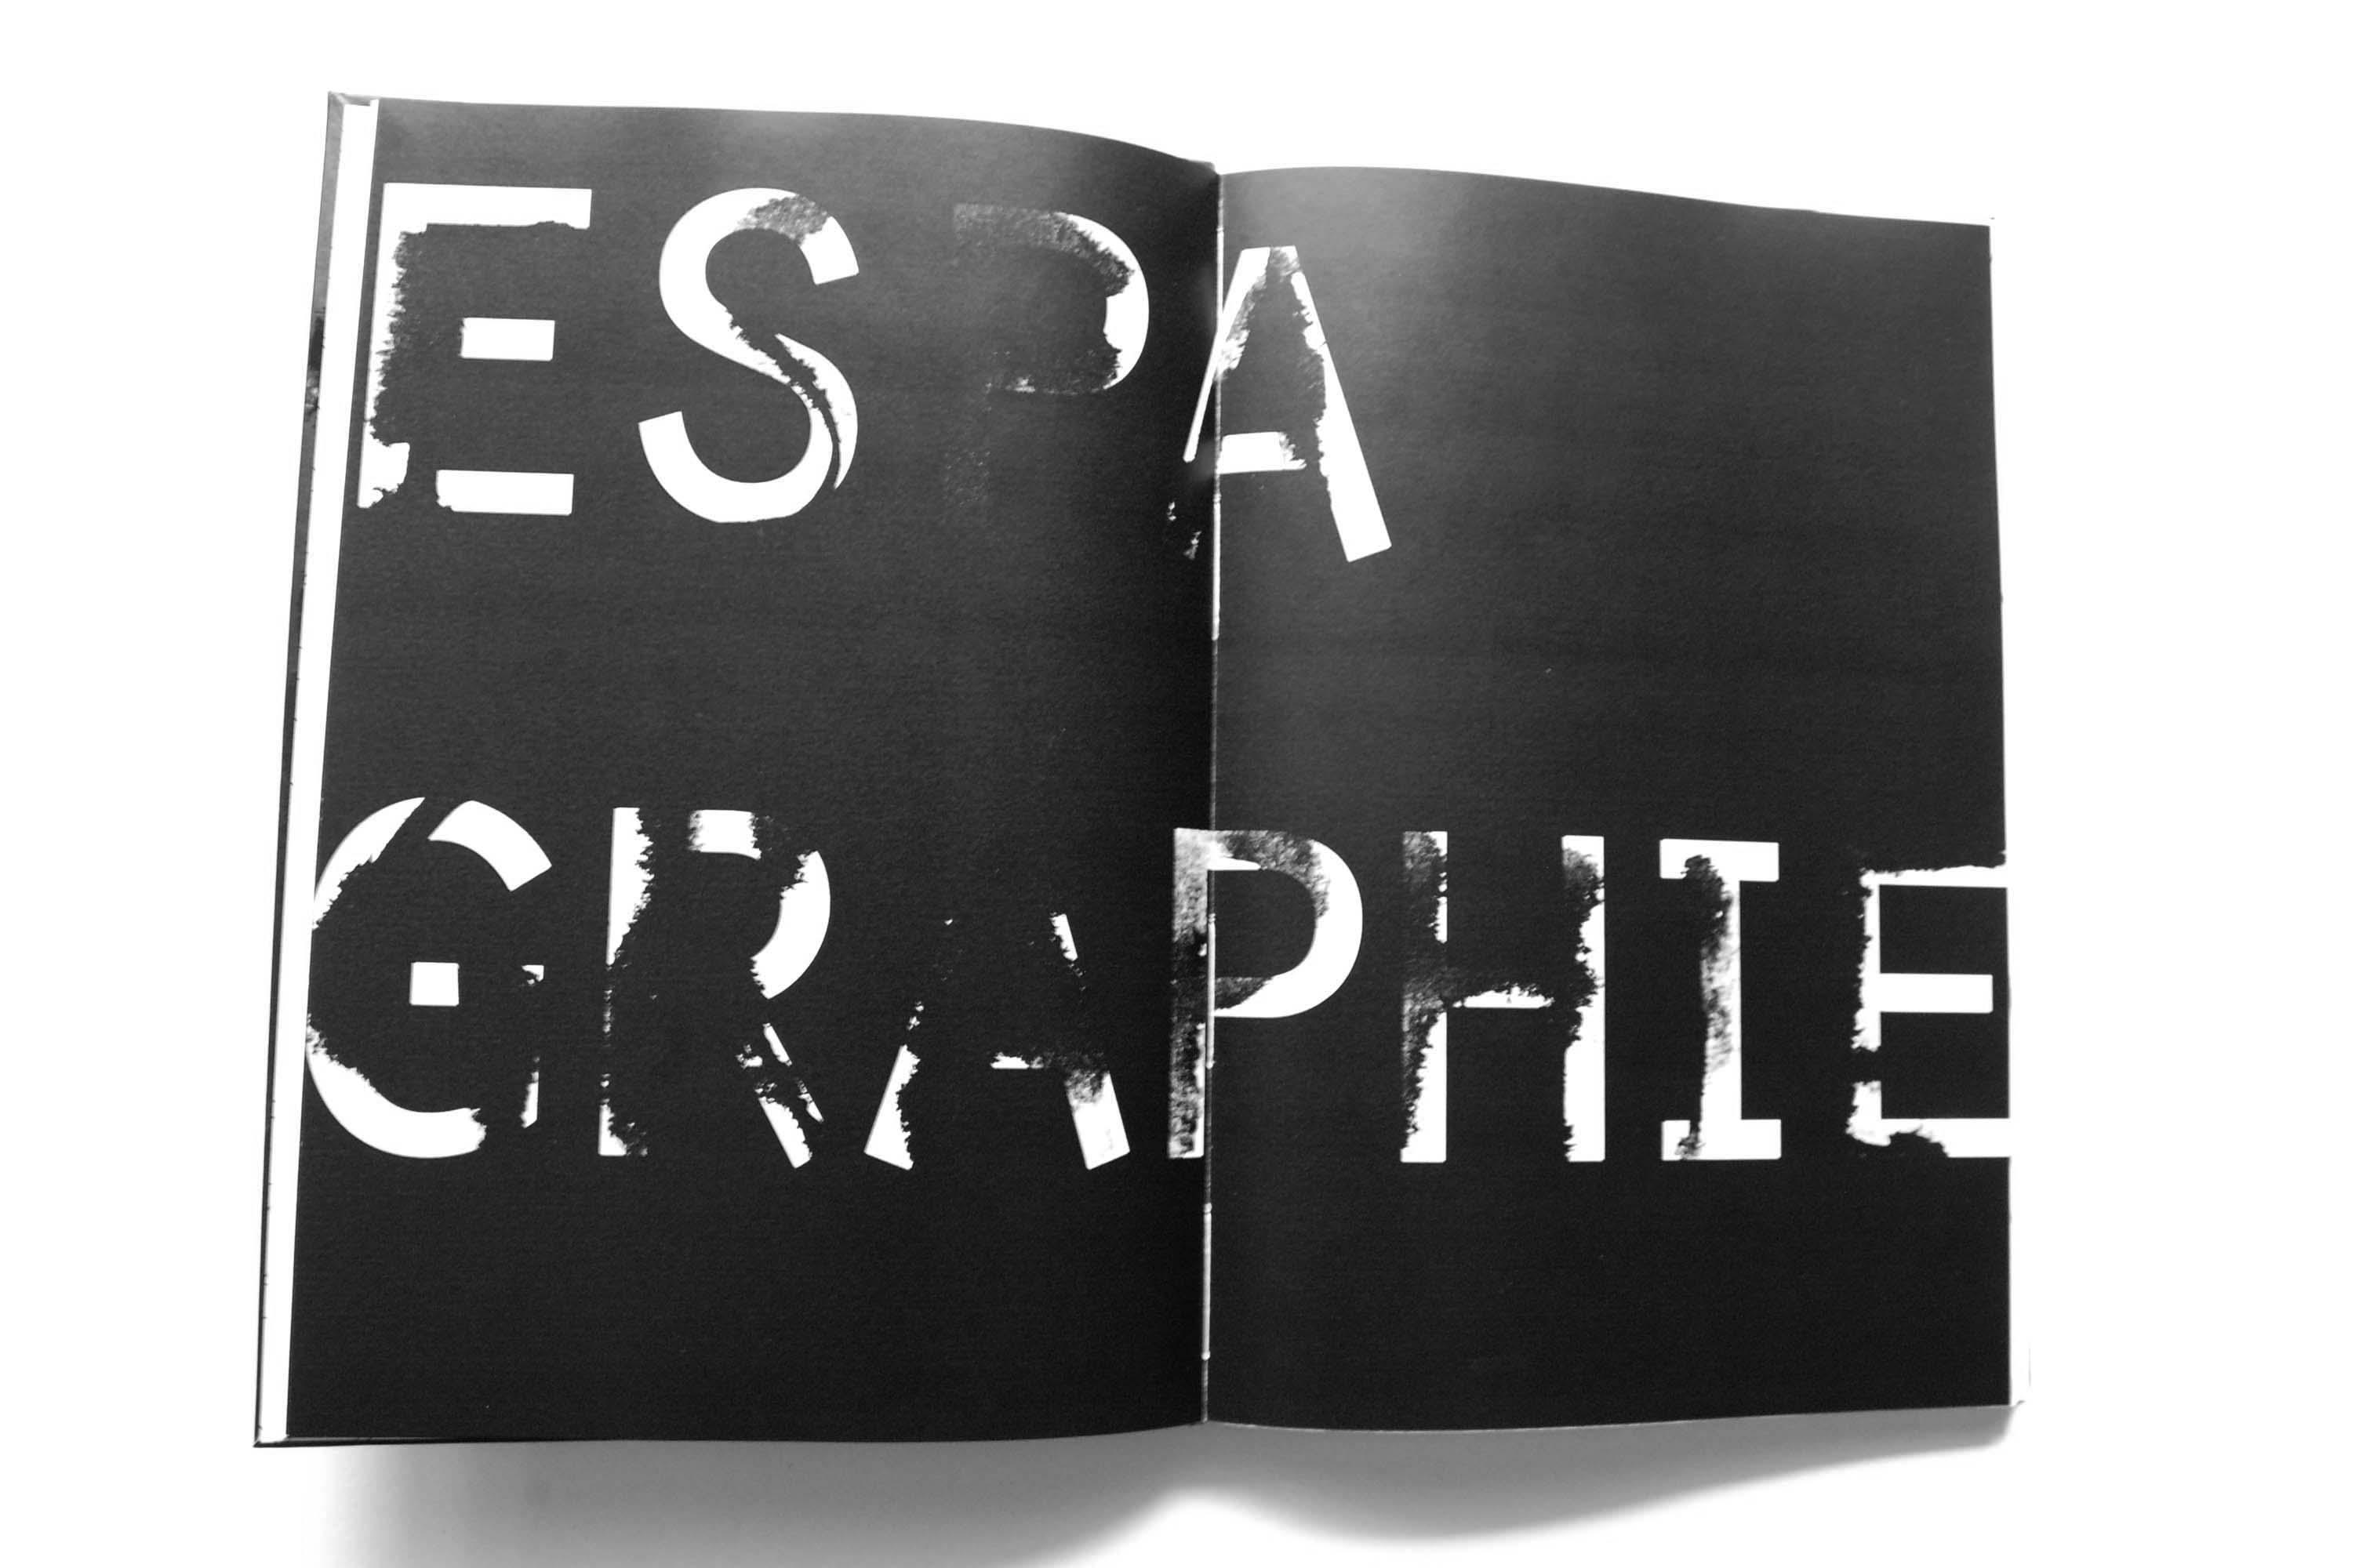 Espagraphie